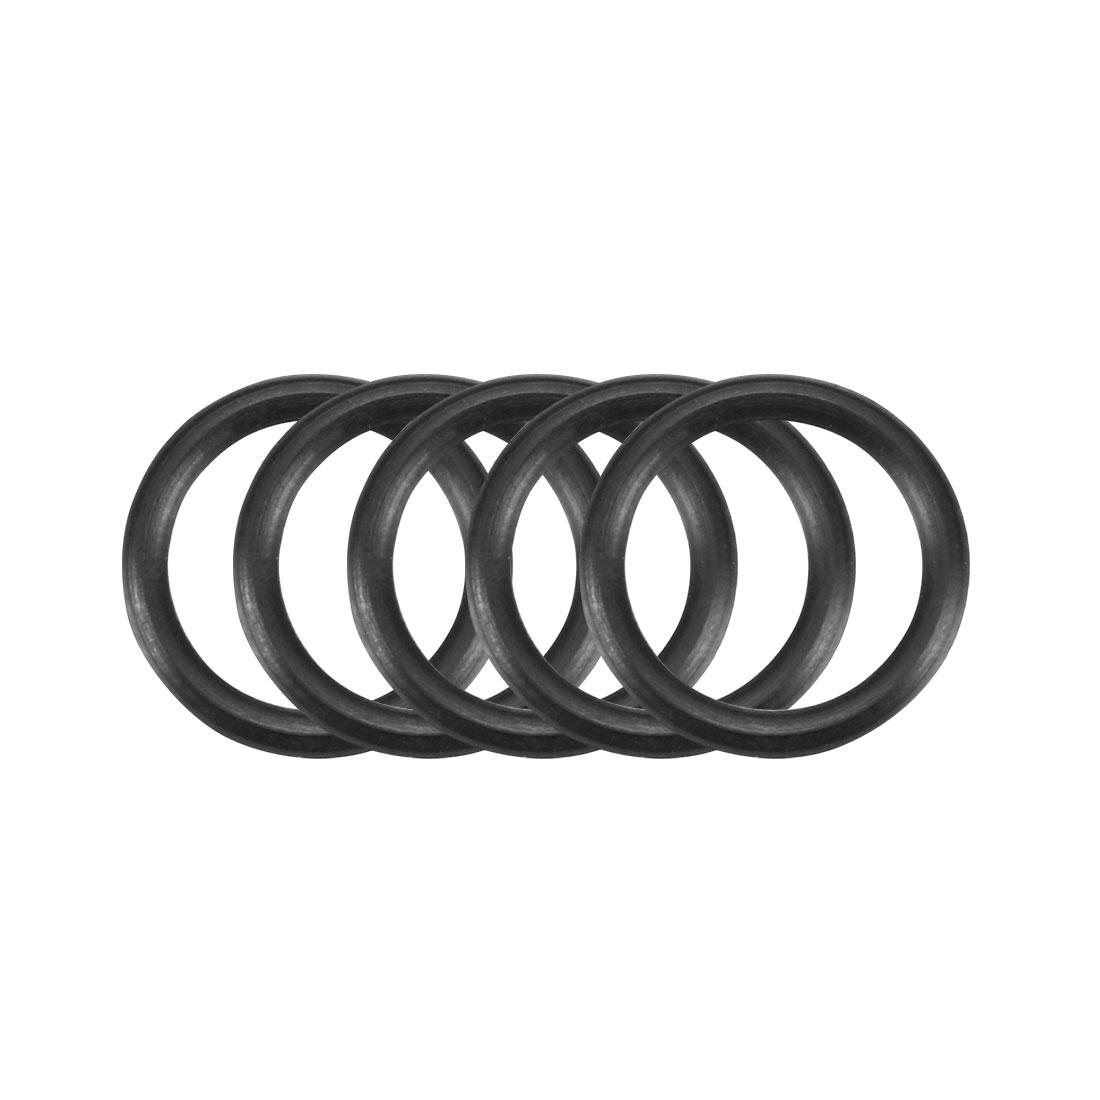 50 Pcs Black 12mm x 1.5mm Nitrile Rubber O Ring NBR Oil Sealing Grommets